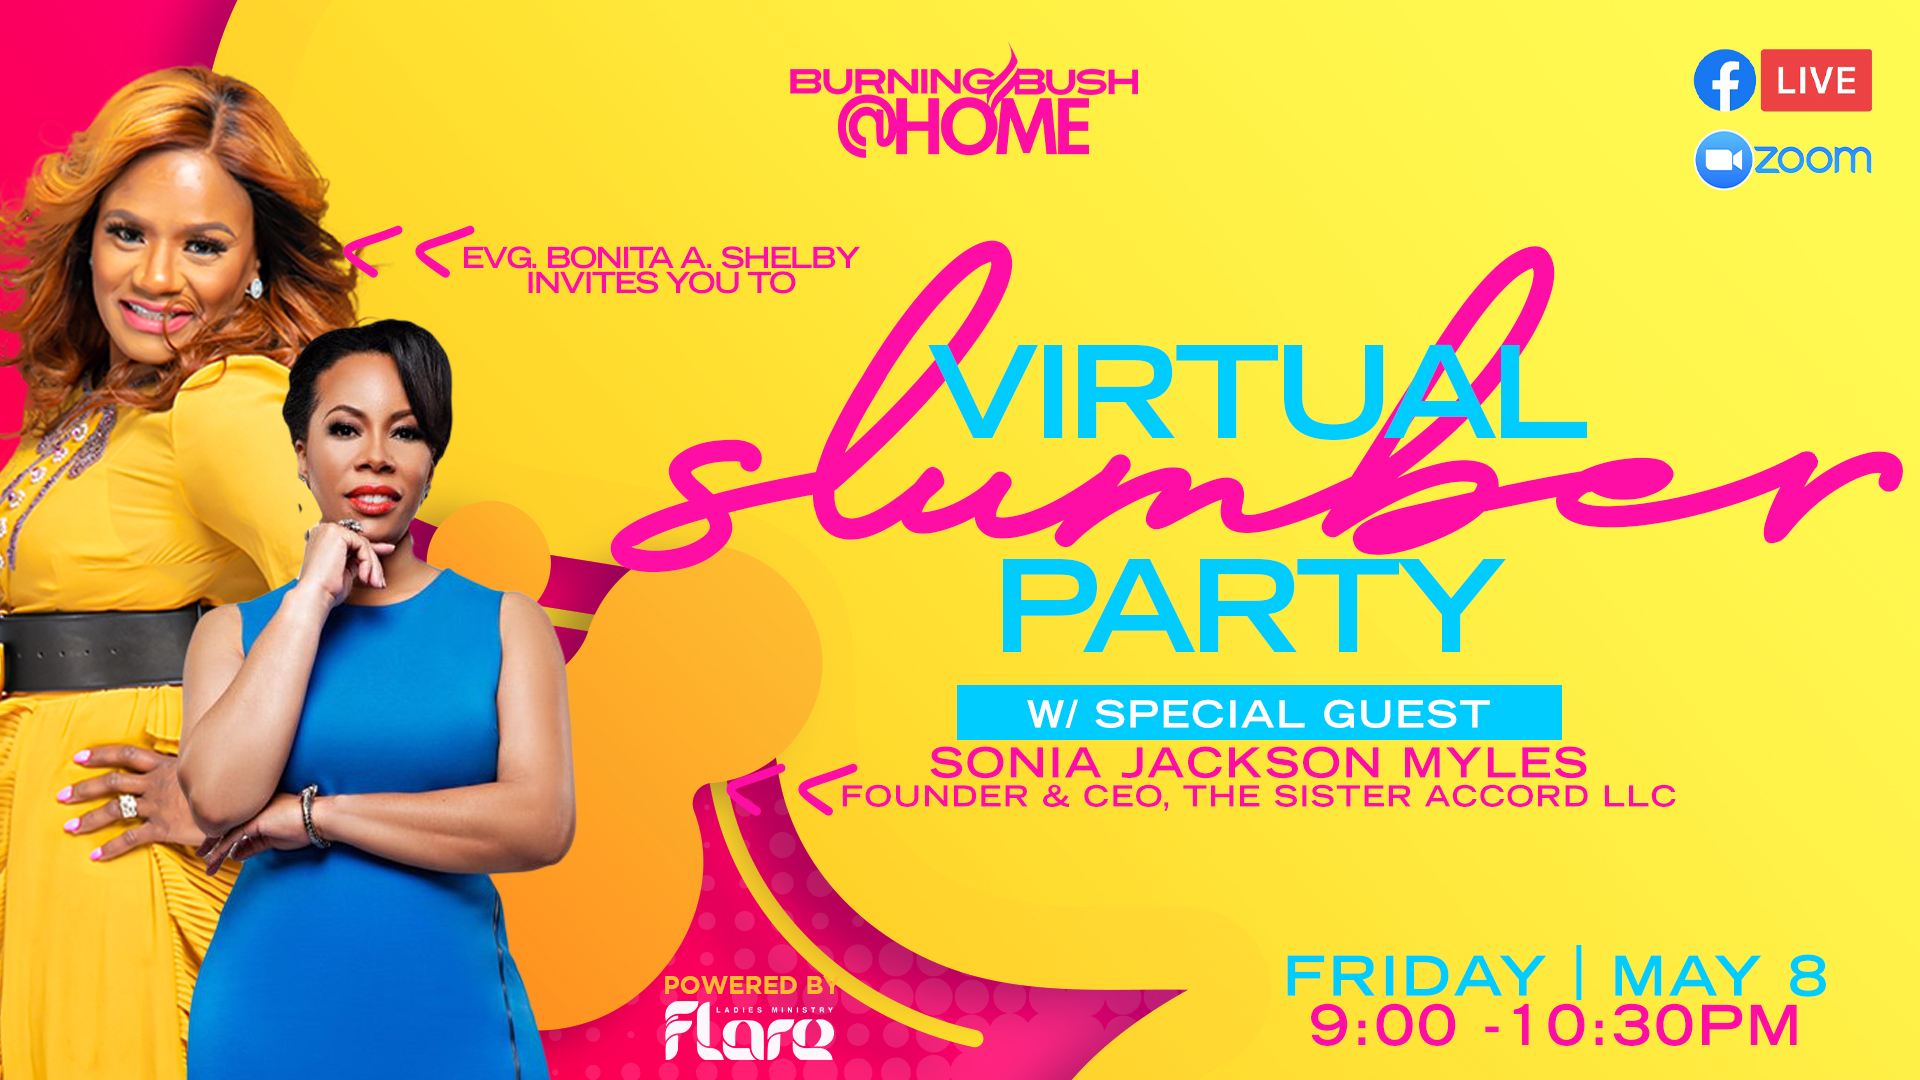 Virtual Slumber Party